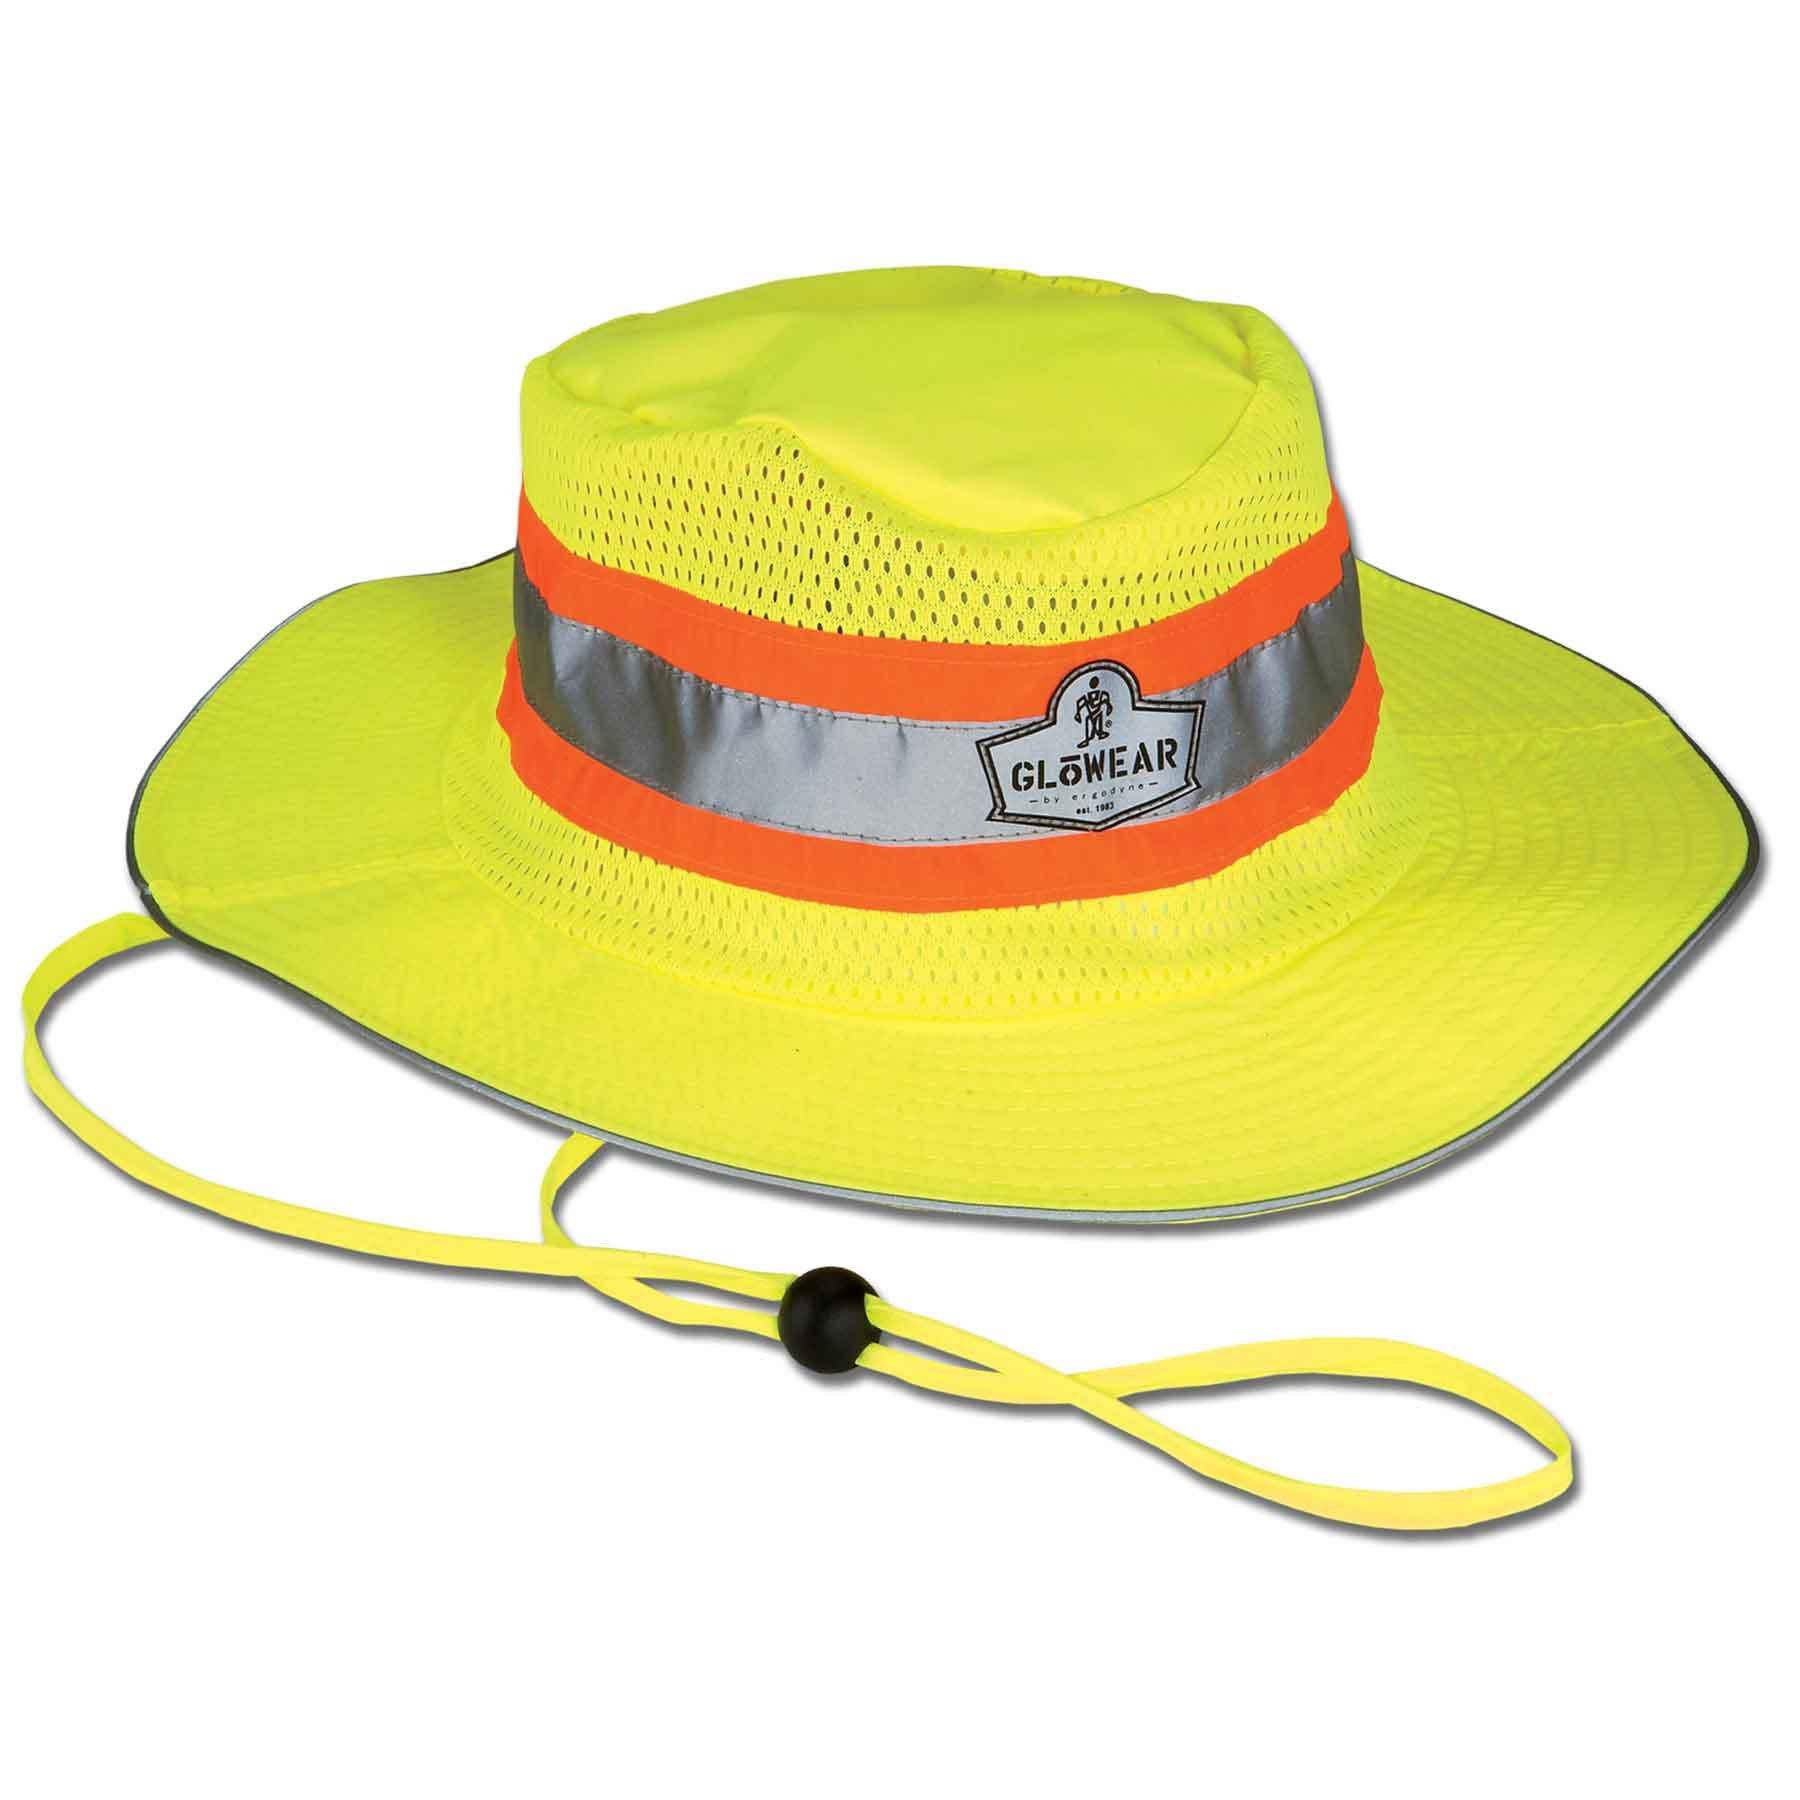 Ergodyne GloWear 8935 High-Visibility Ranger Hat, XX-Large/3X-Large, Lime